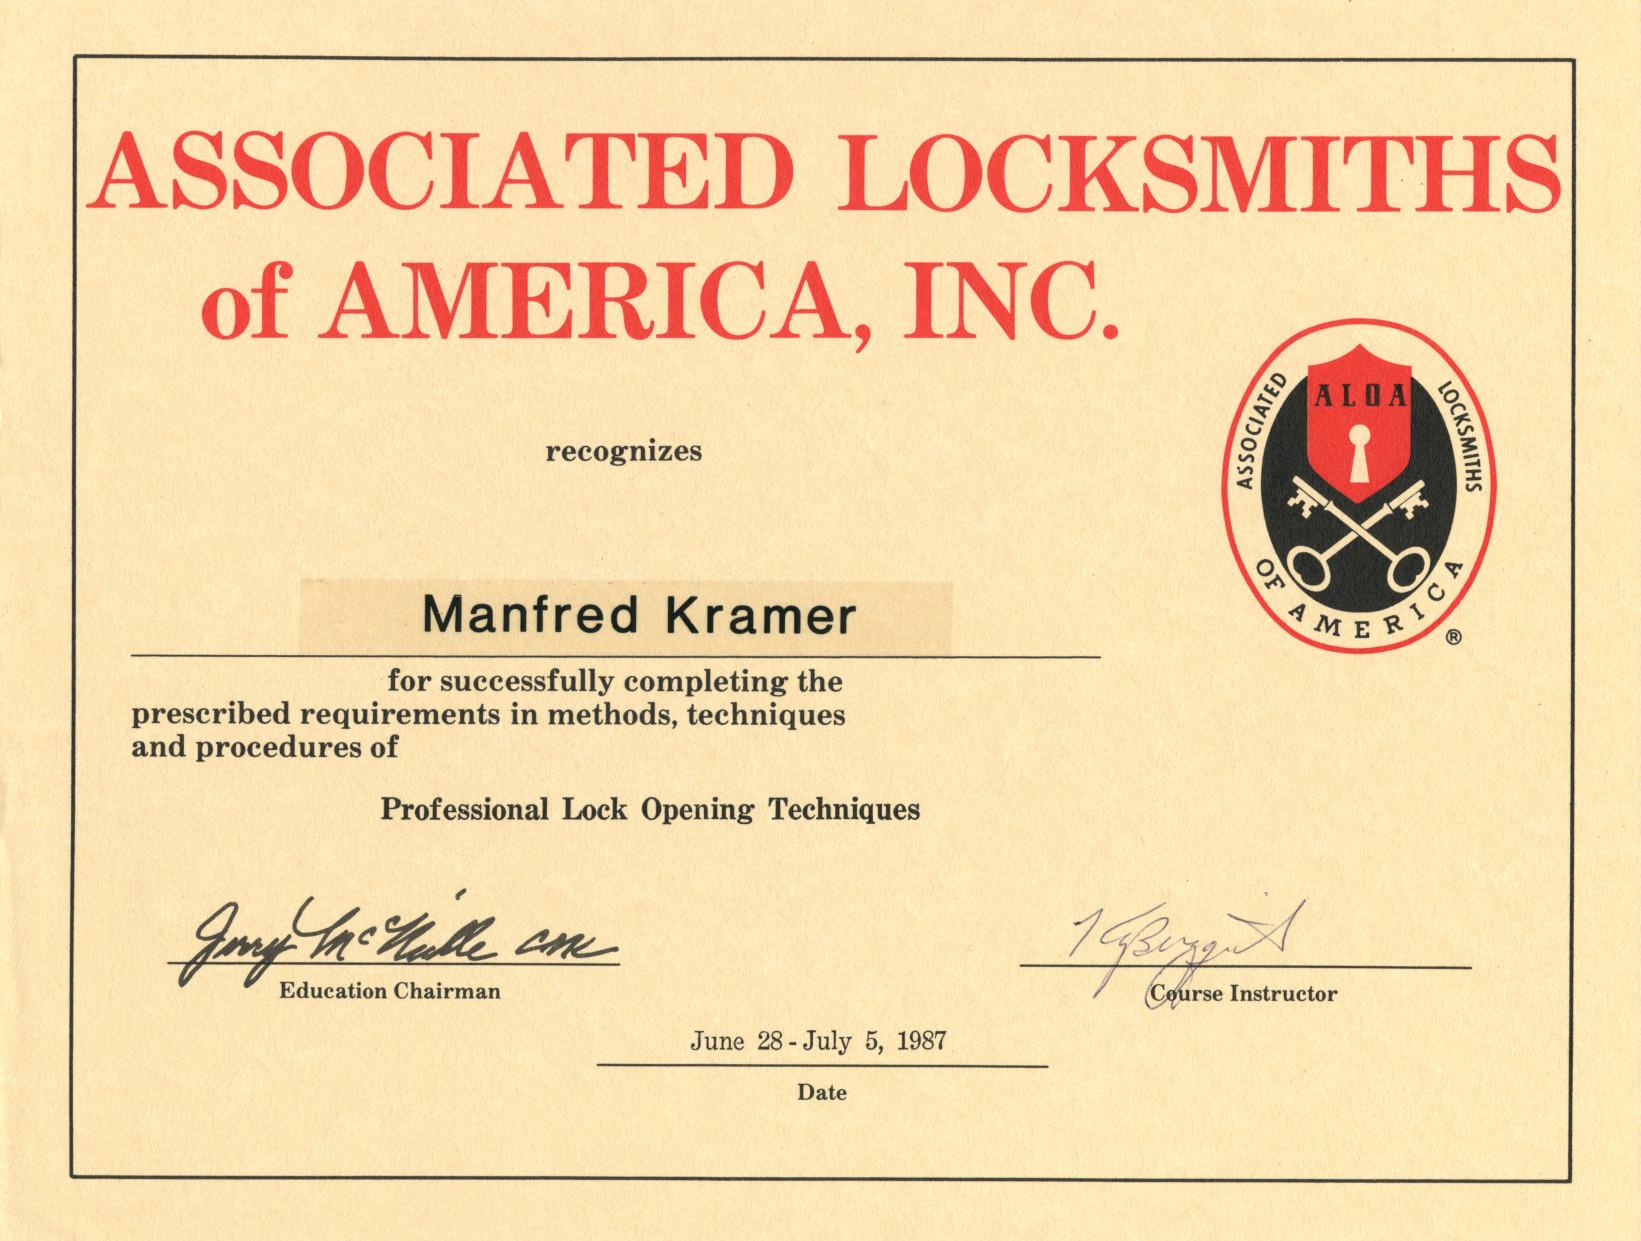 ALOA-Professional Lock Opening Techniques 1987